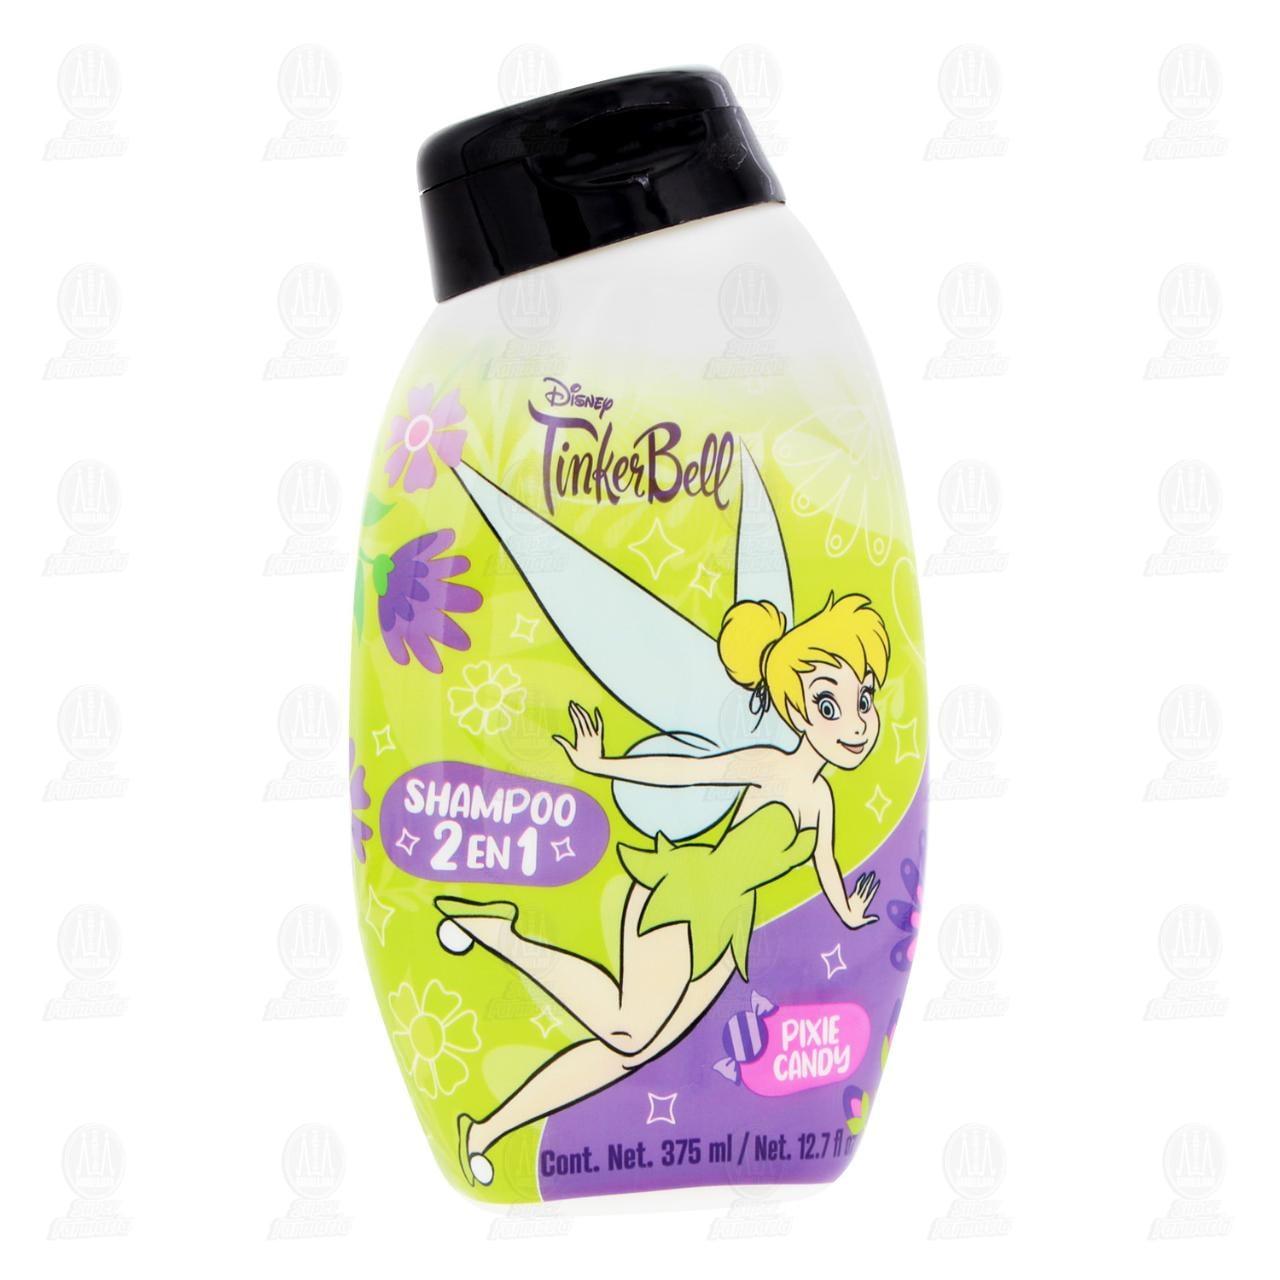 Comprar Shampoo Disney Emoji Candy, 375 ml. en Farmacias Guadalajara